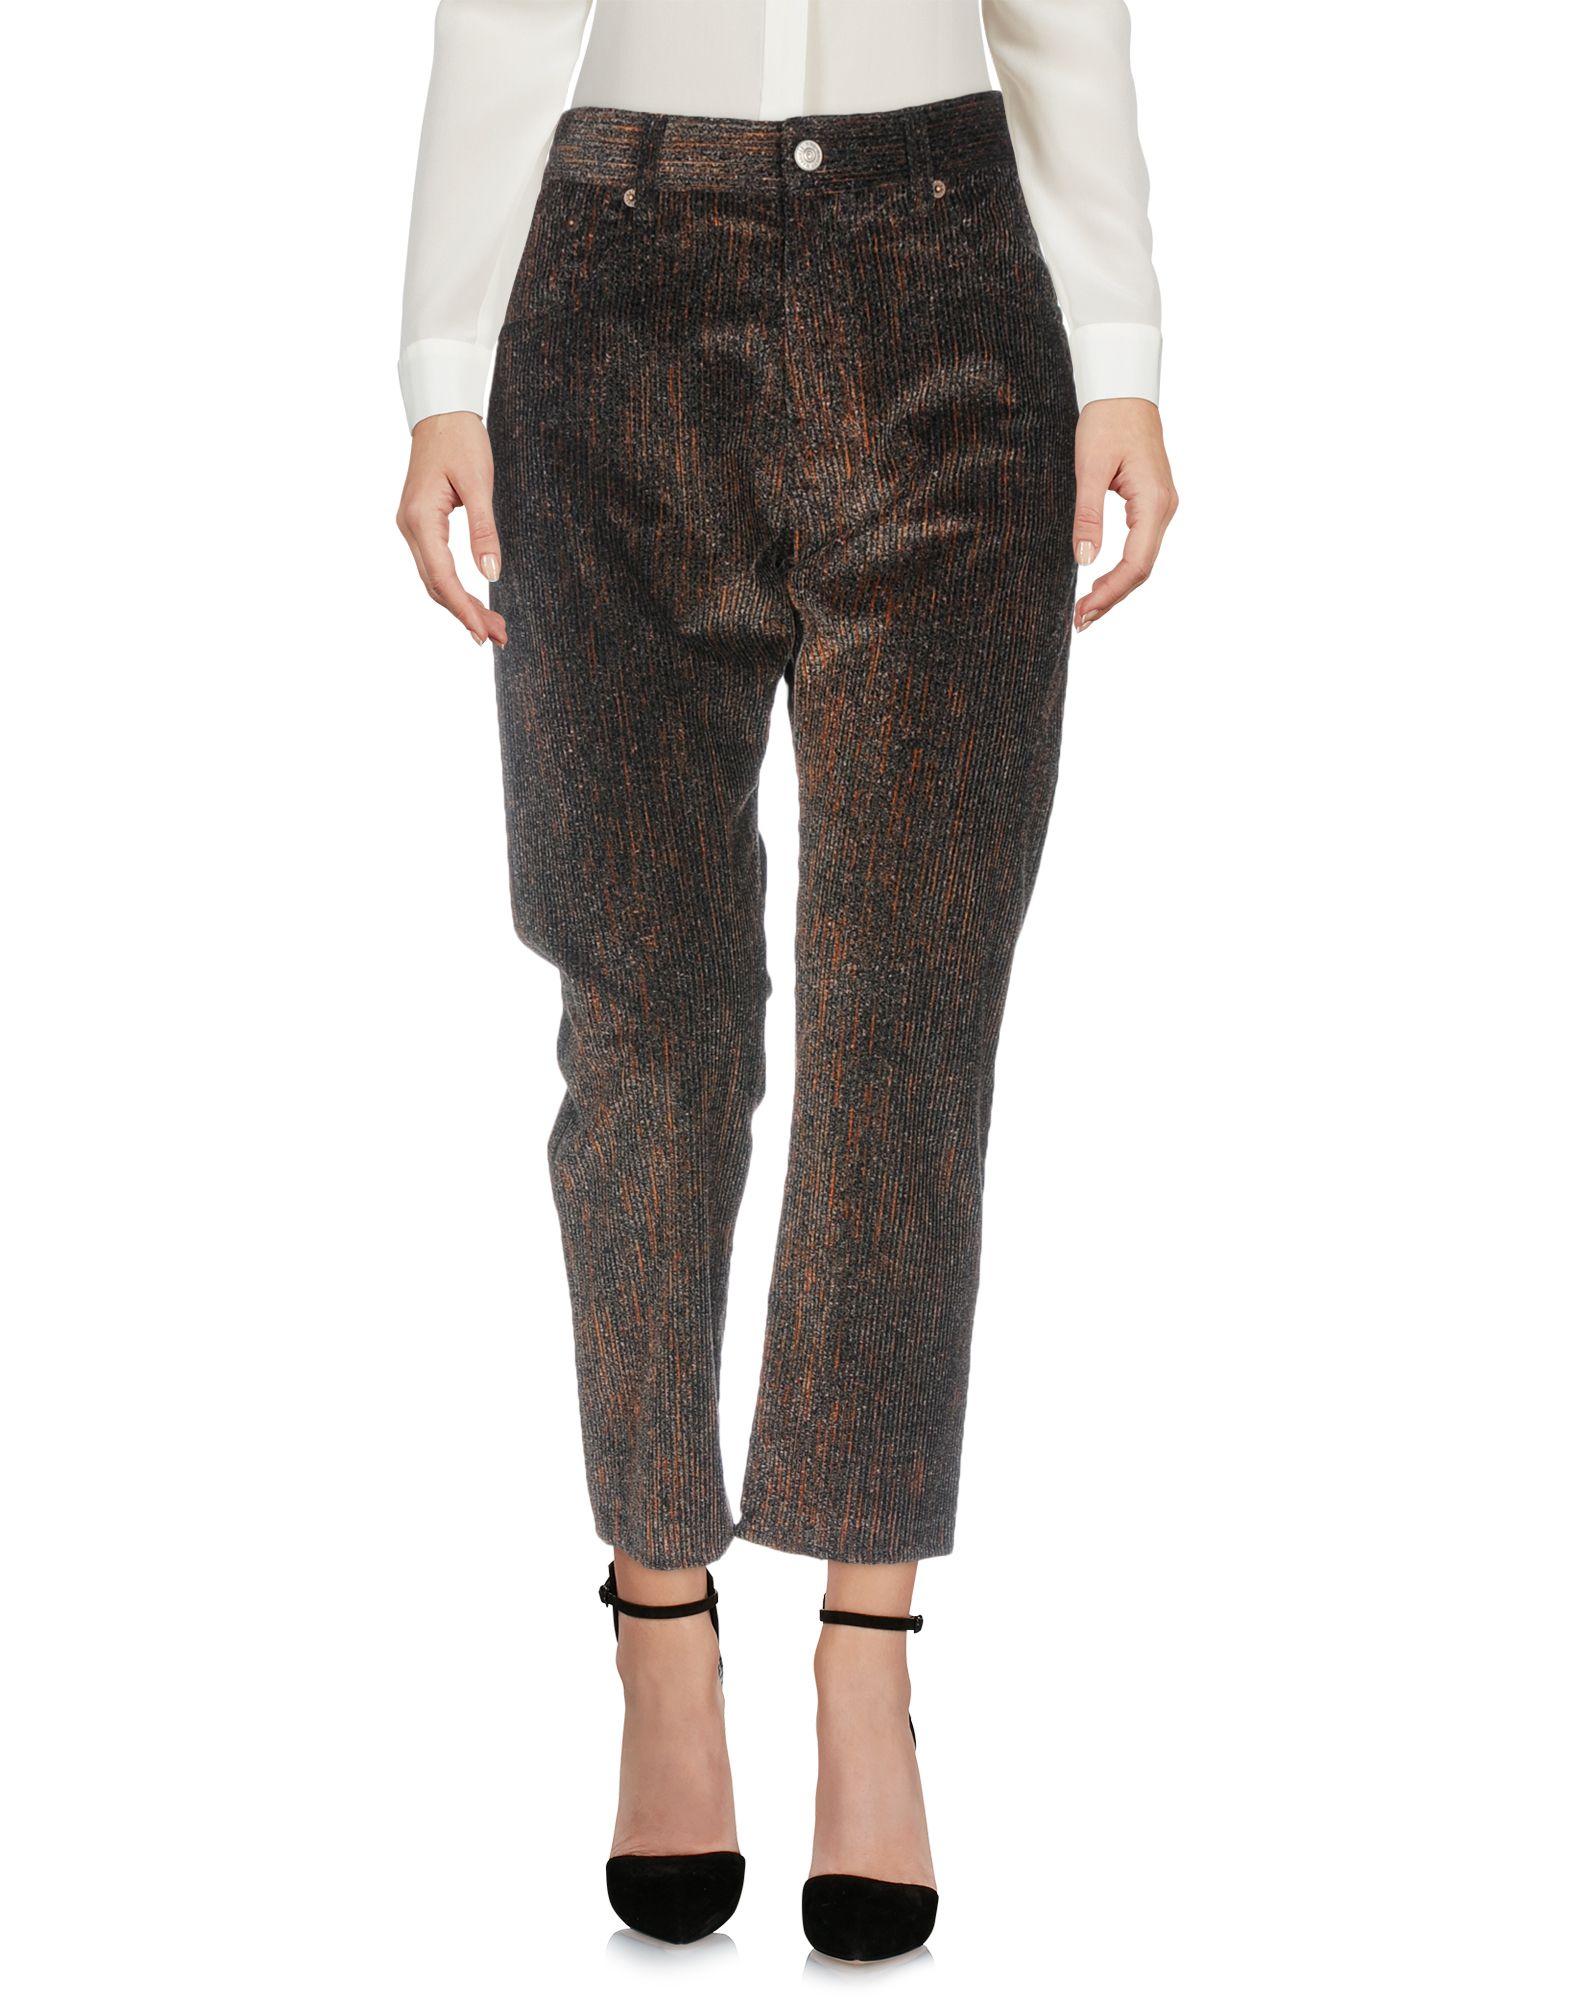 Pantalone Mm6 Maison Margiela Donna - Acquista online su 8k3esI